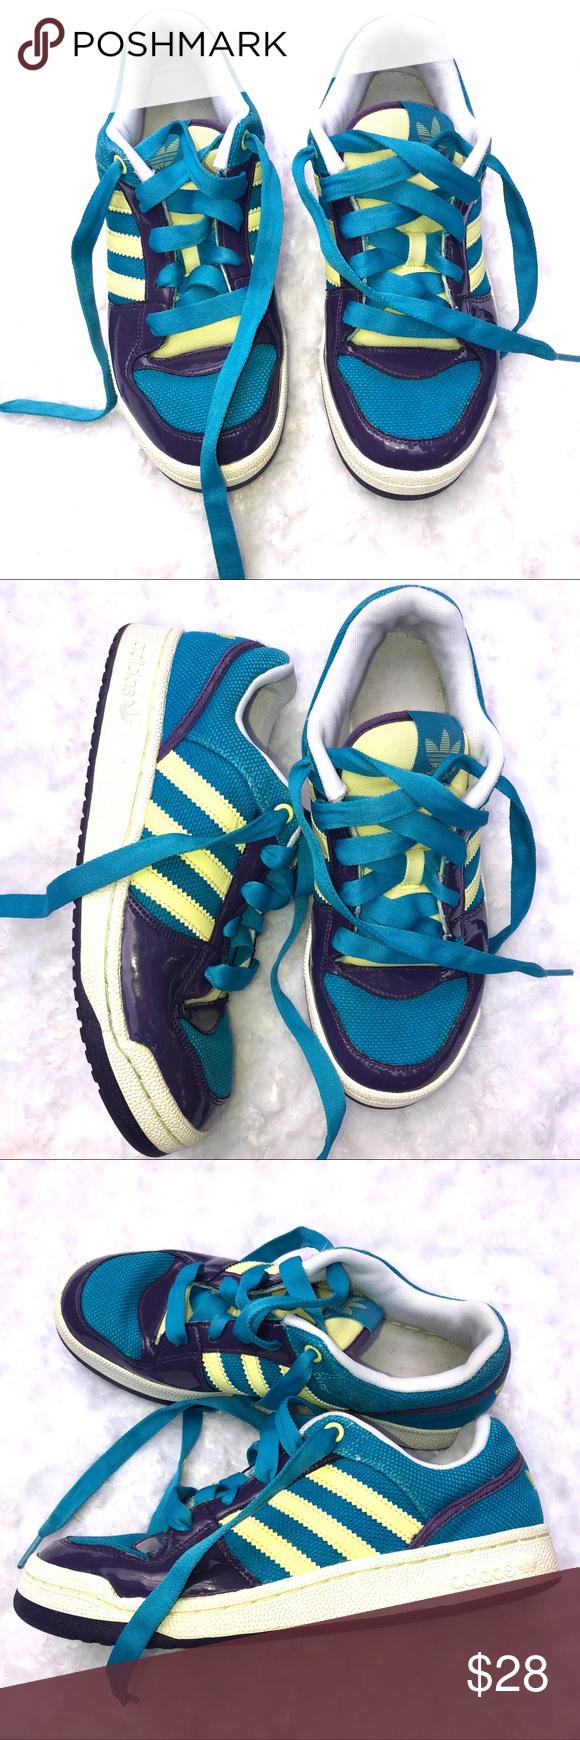 388b4b9ea1861 Girls Adidas sneakers size 7 Girls Adidas sneakers size 7 Good condition  adidas Shoes Sneakers